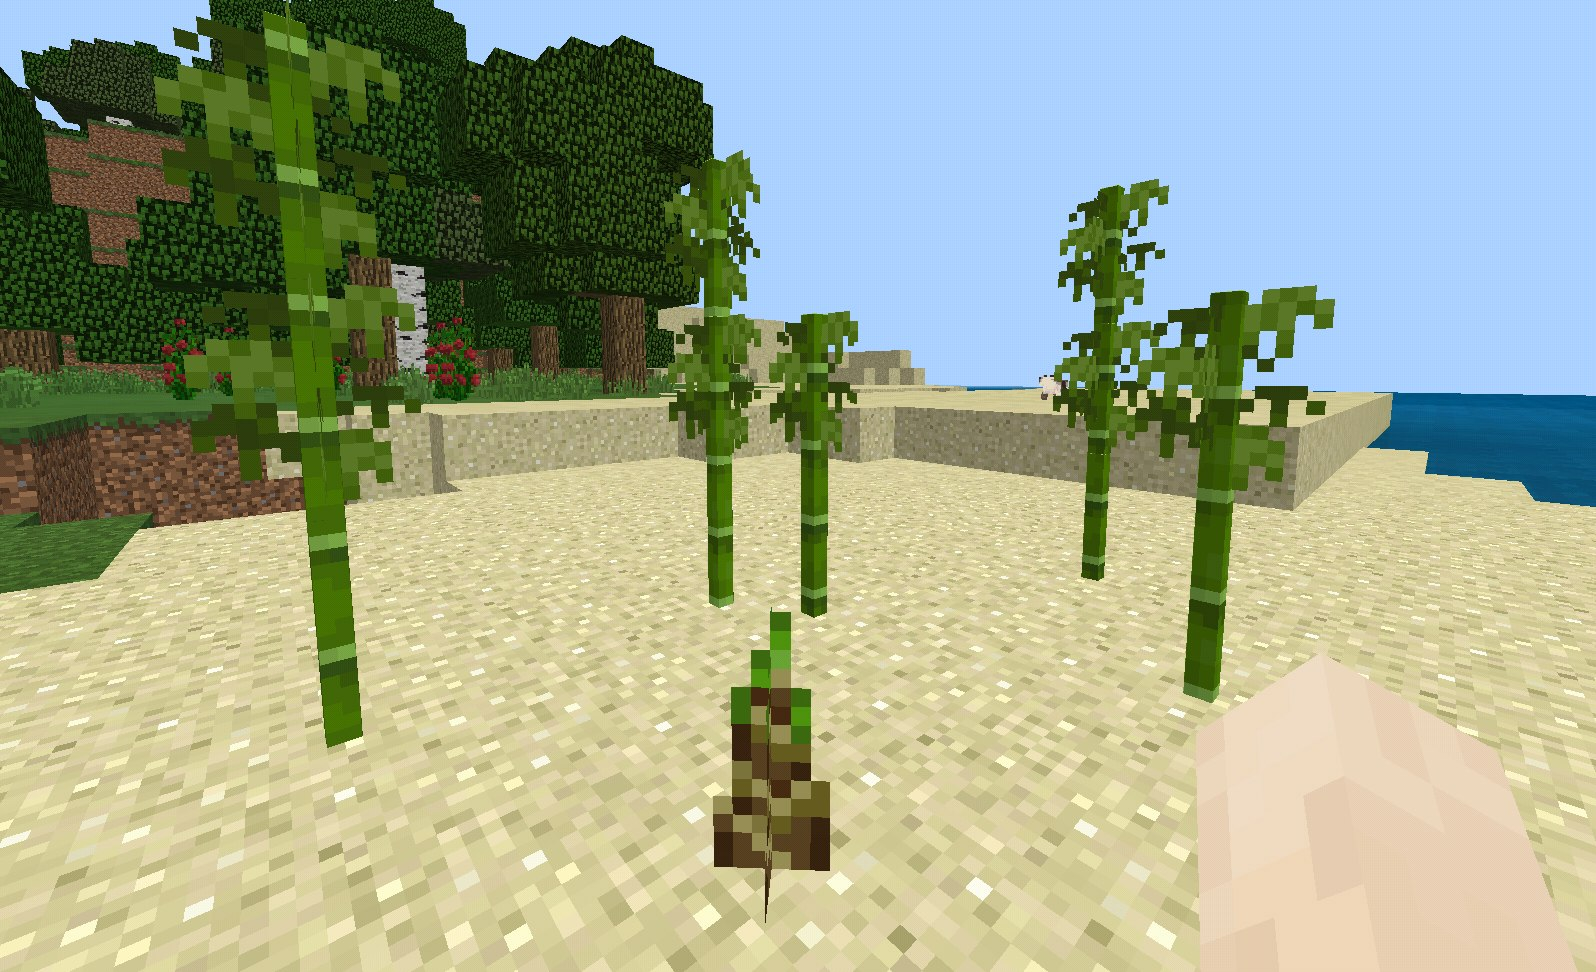 rosnacy bambus minecraft 1.14